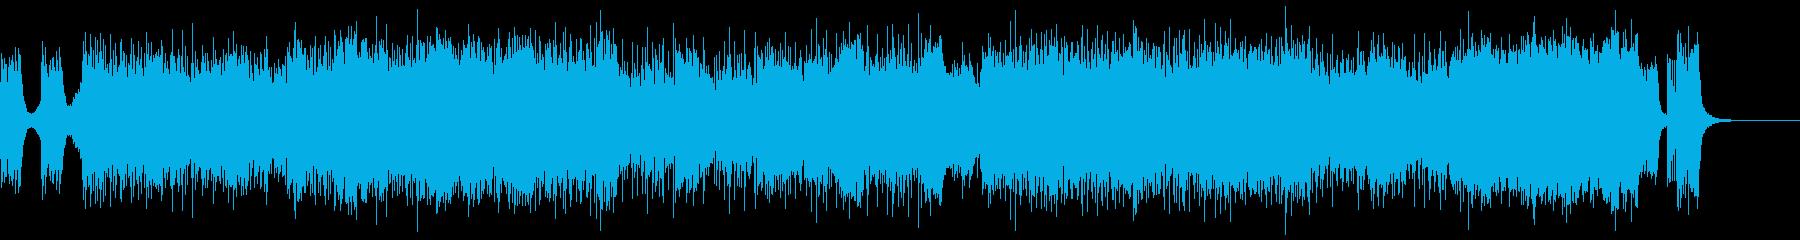 16bit,48kHzバージョンです。の再生済みの波形